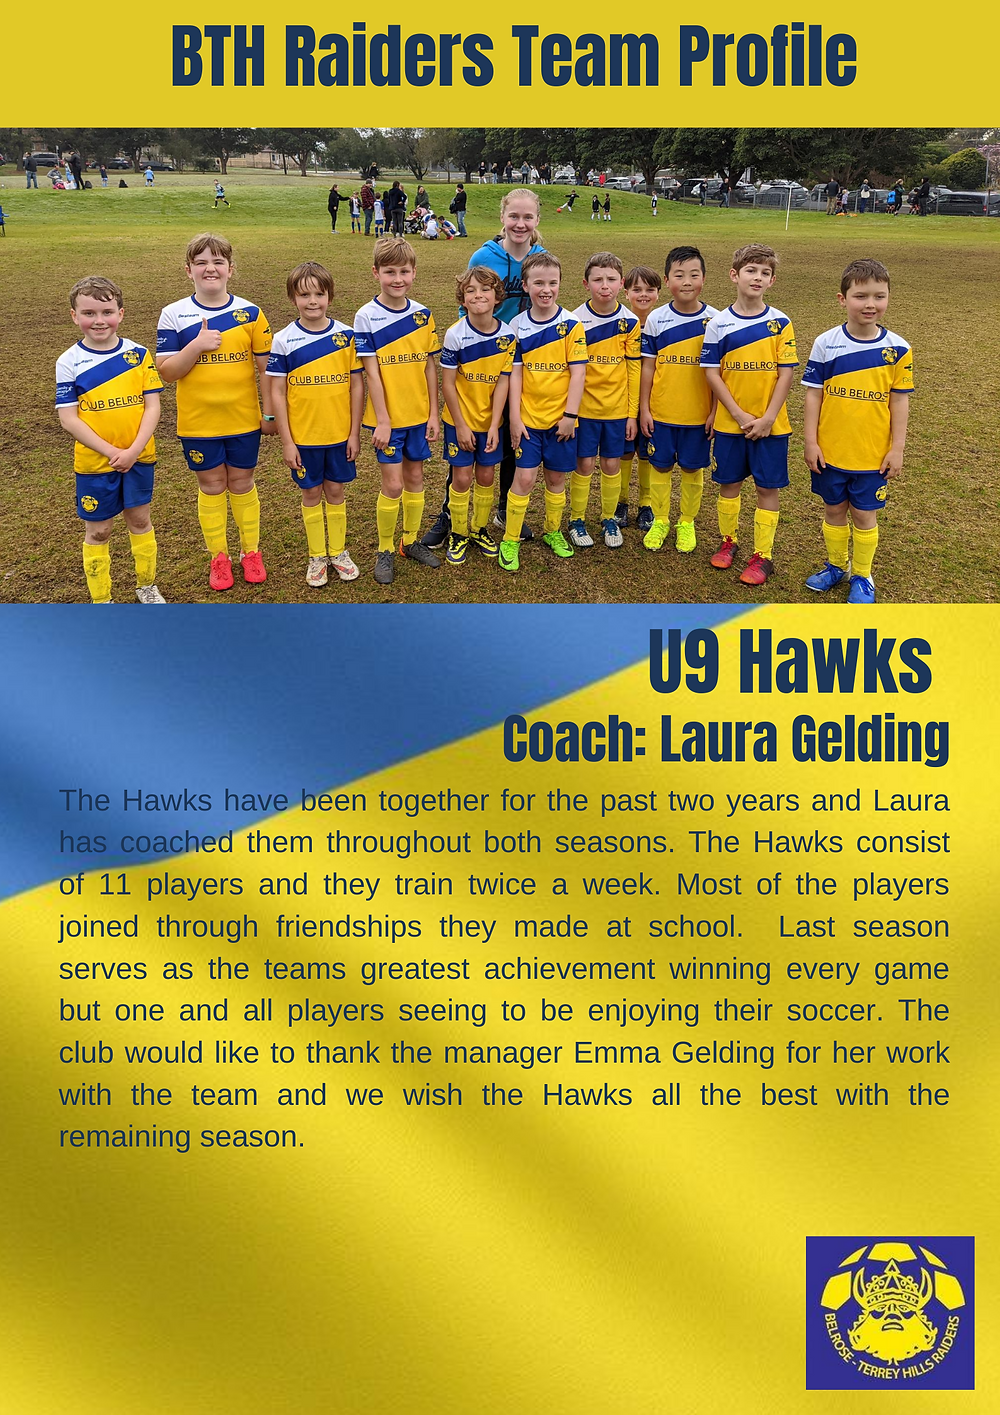 U9 The Hawks